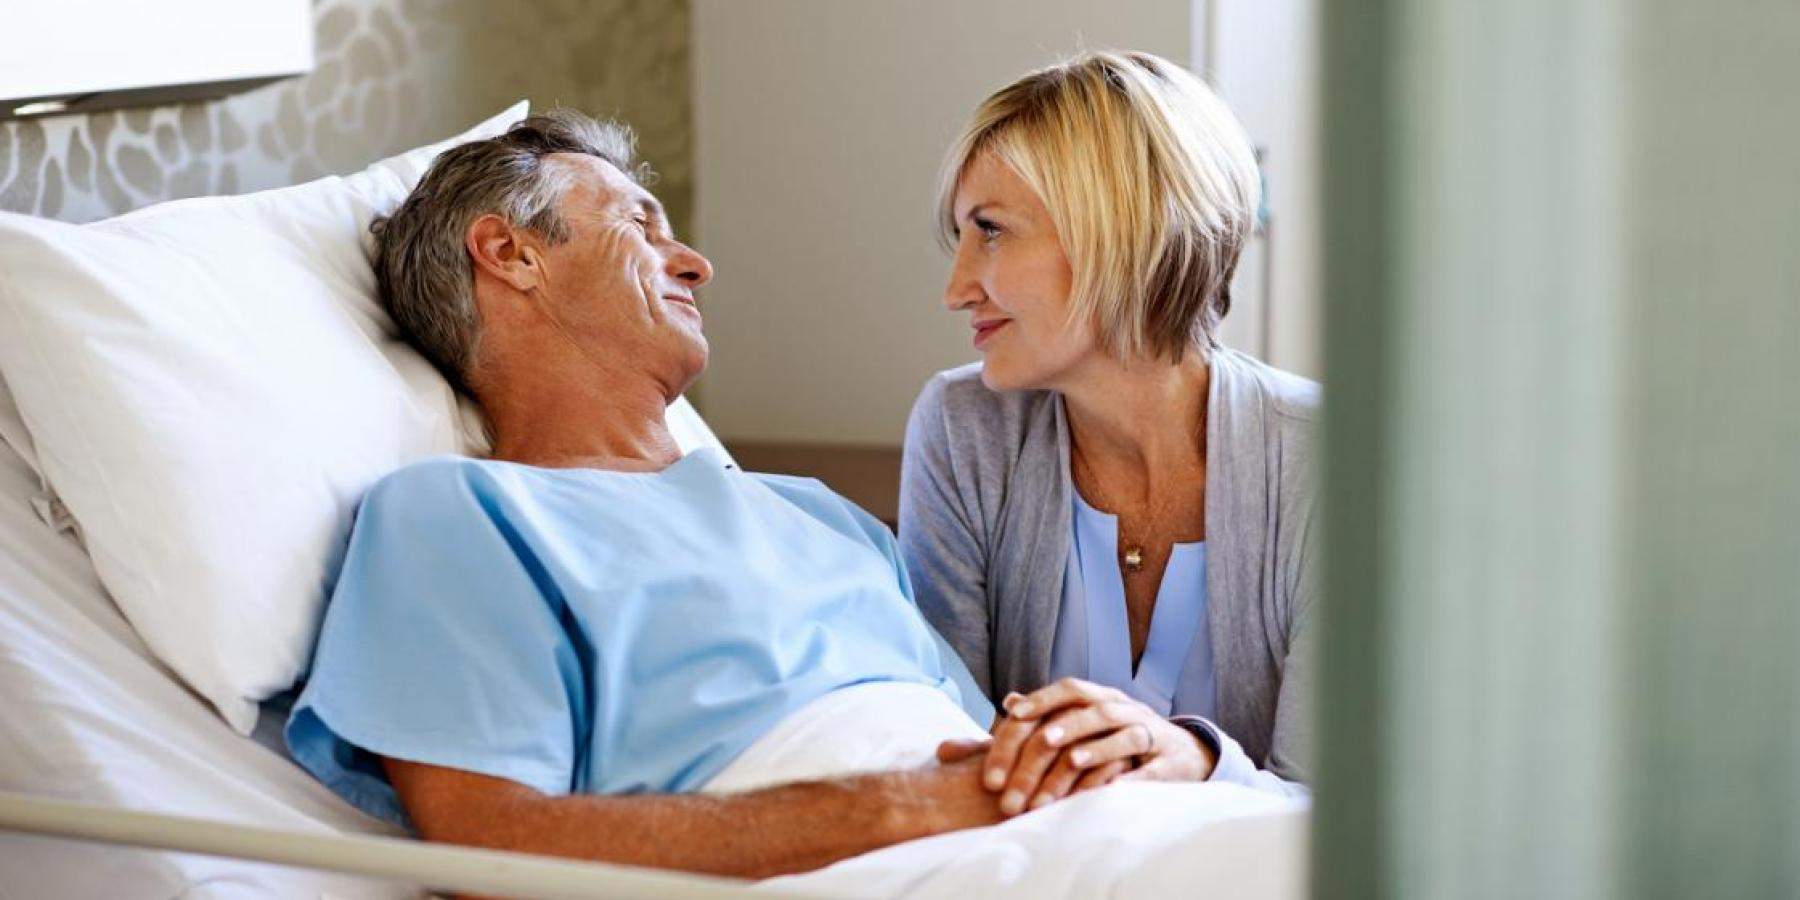 World Stroke Day, 29 October   Couple in hospital © World Stroke Organization